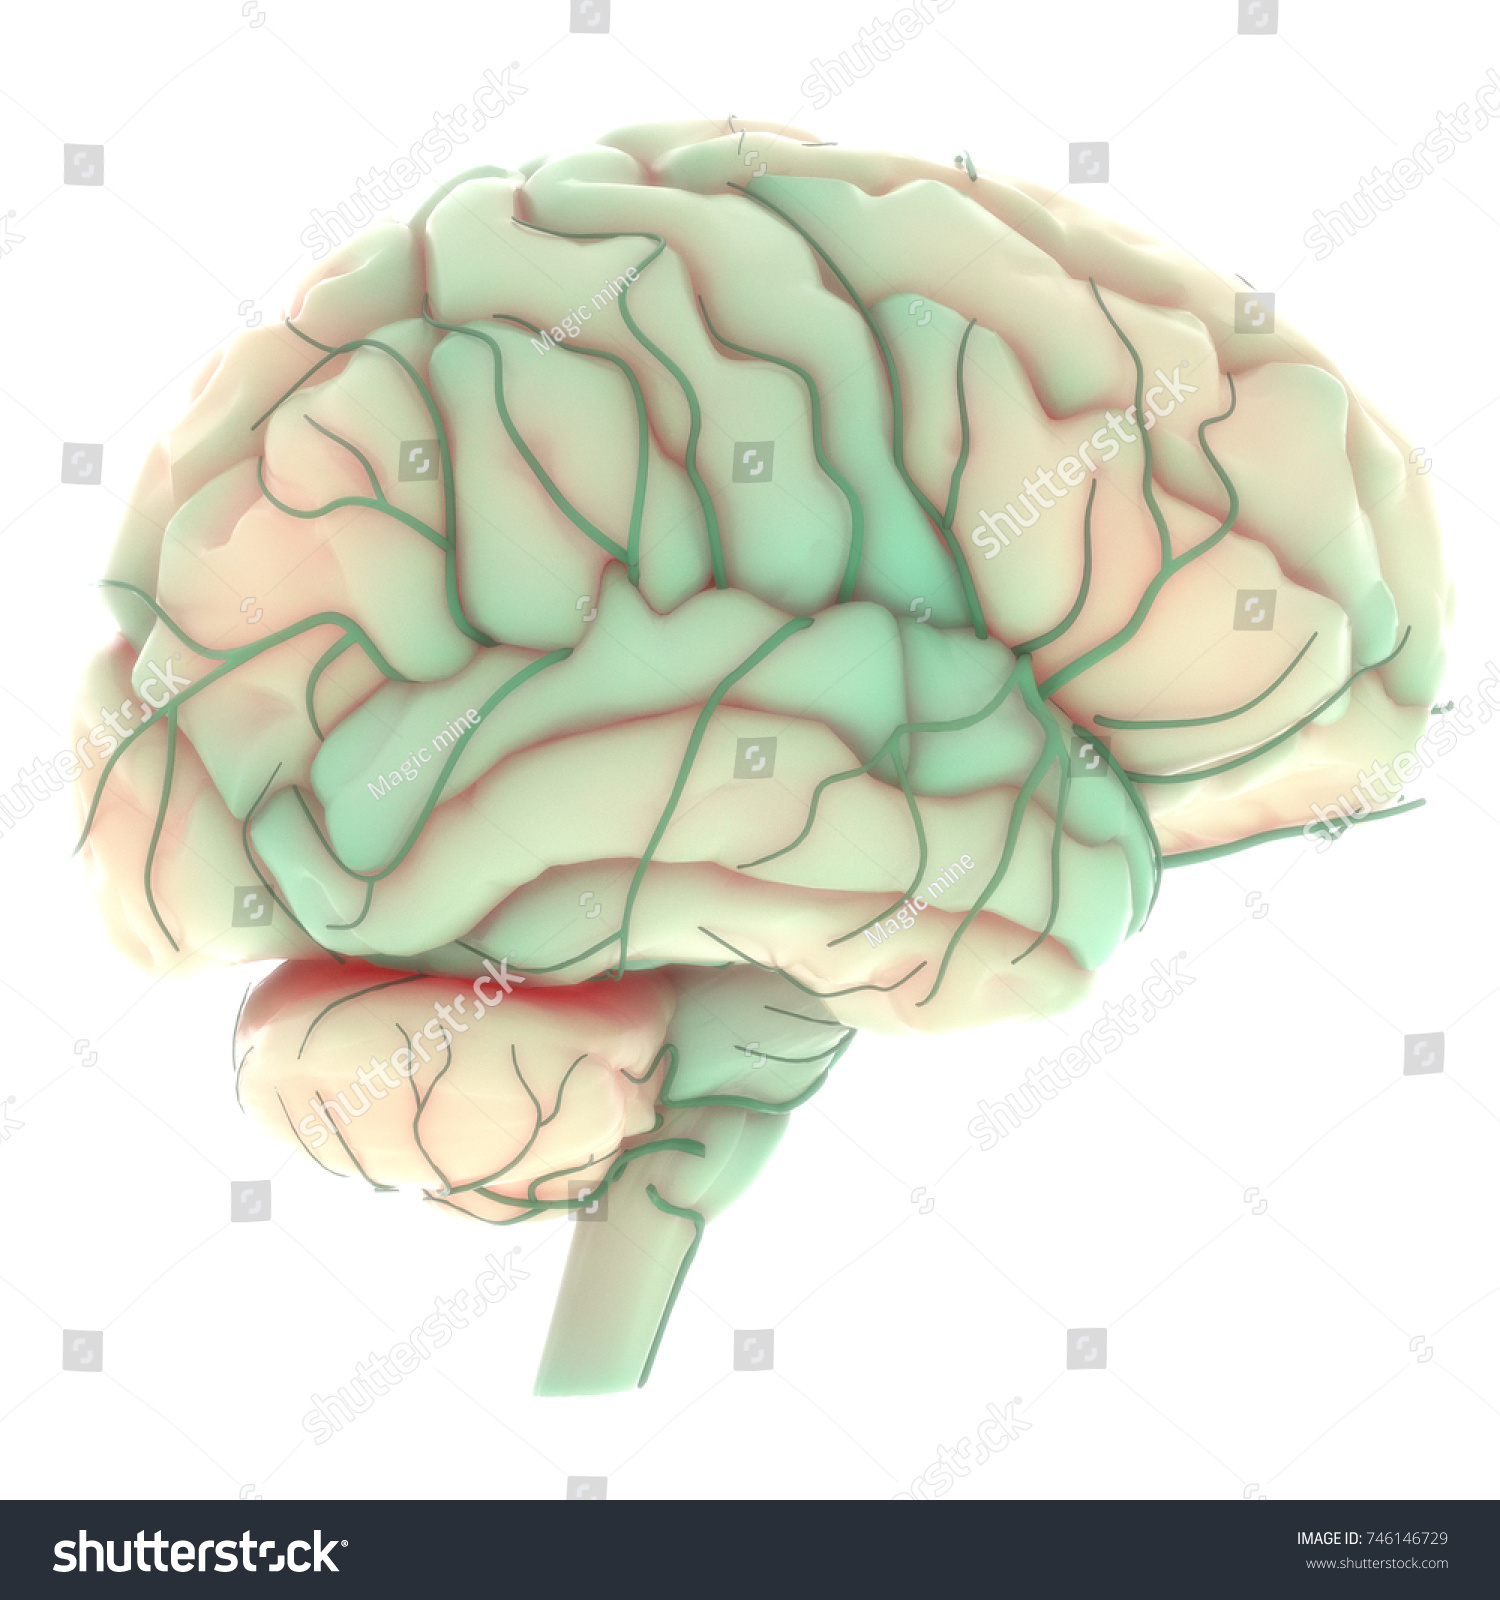 Human Brain Nervous System Anatomy 3 D Stock Illustration 746146729 ...